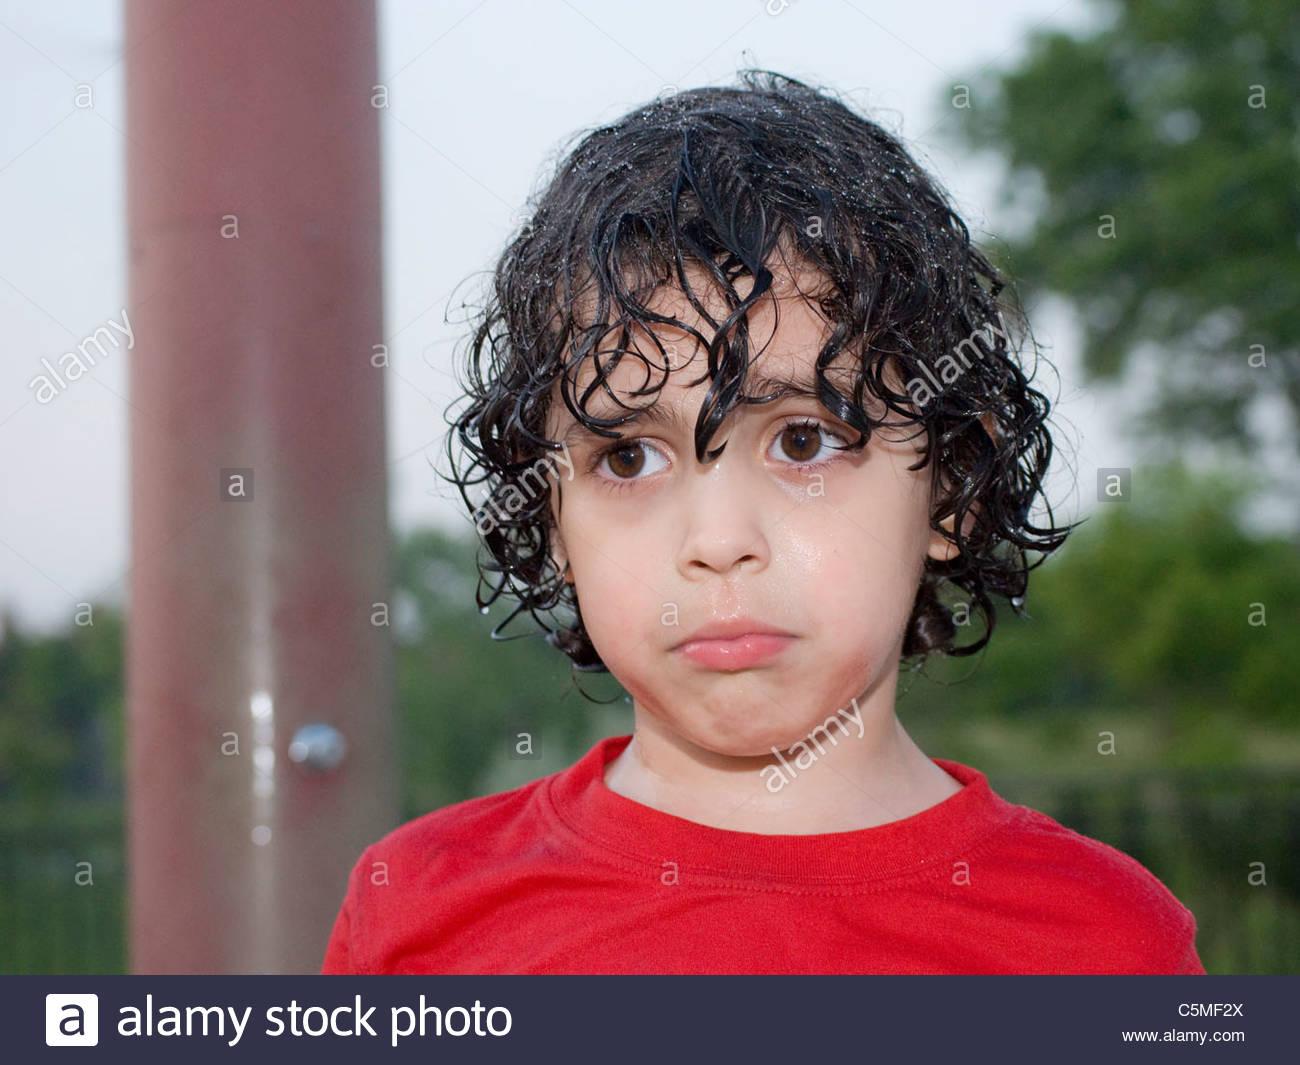 Boy Wet Hair After Playing Stock Photos & Boy Wet Hair